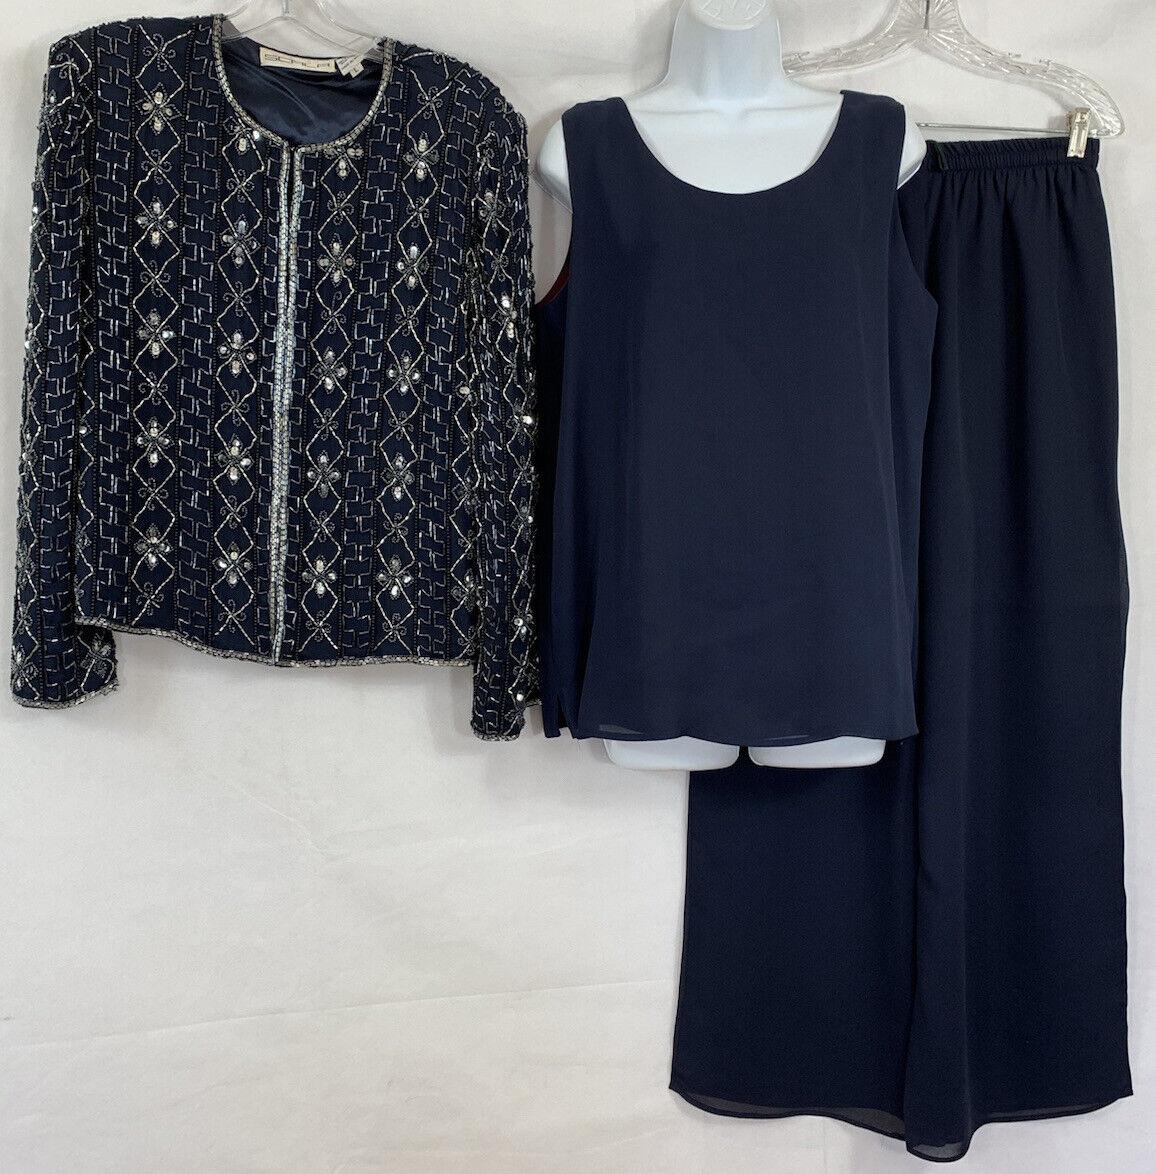 VTG Scala 3 Pc Evening Outfit Silk Bead Sequin Jacket Sleeveless Top Pants Sz L